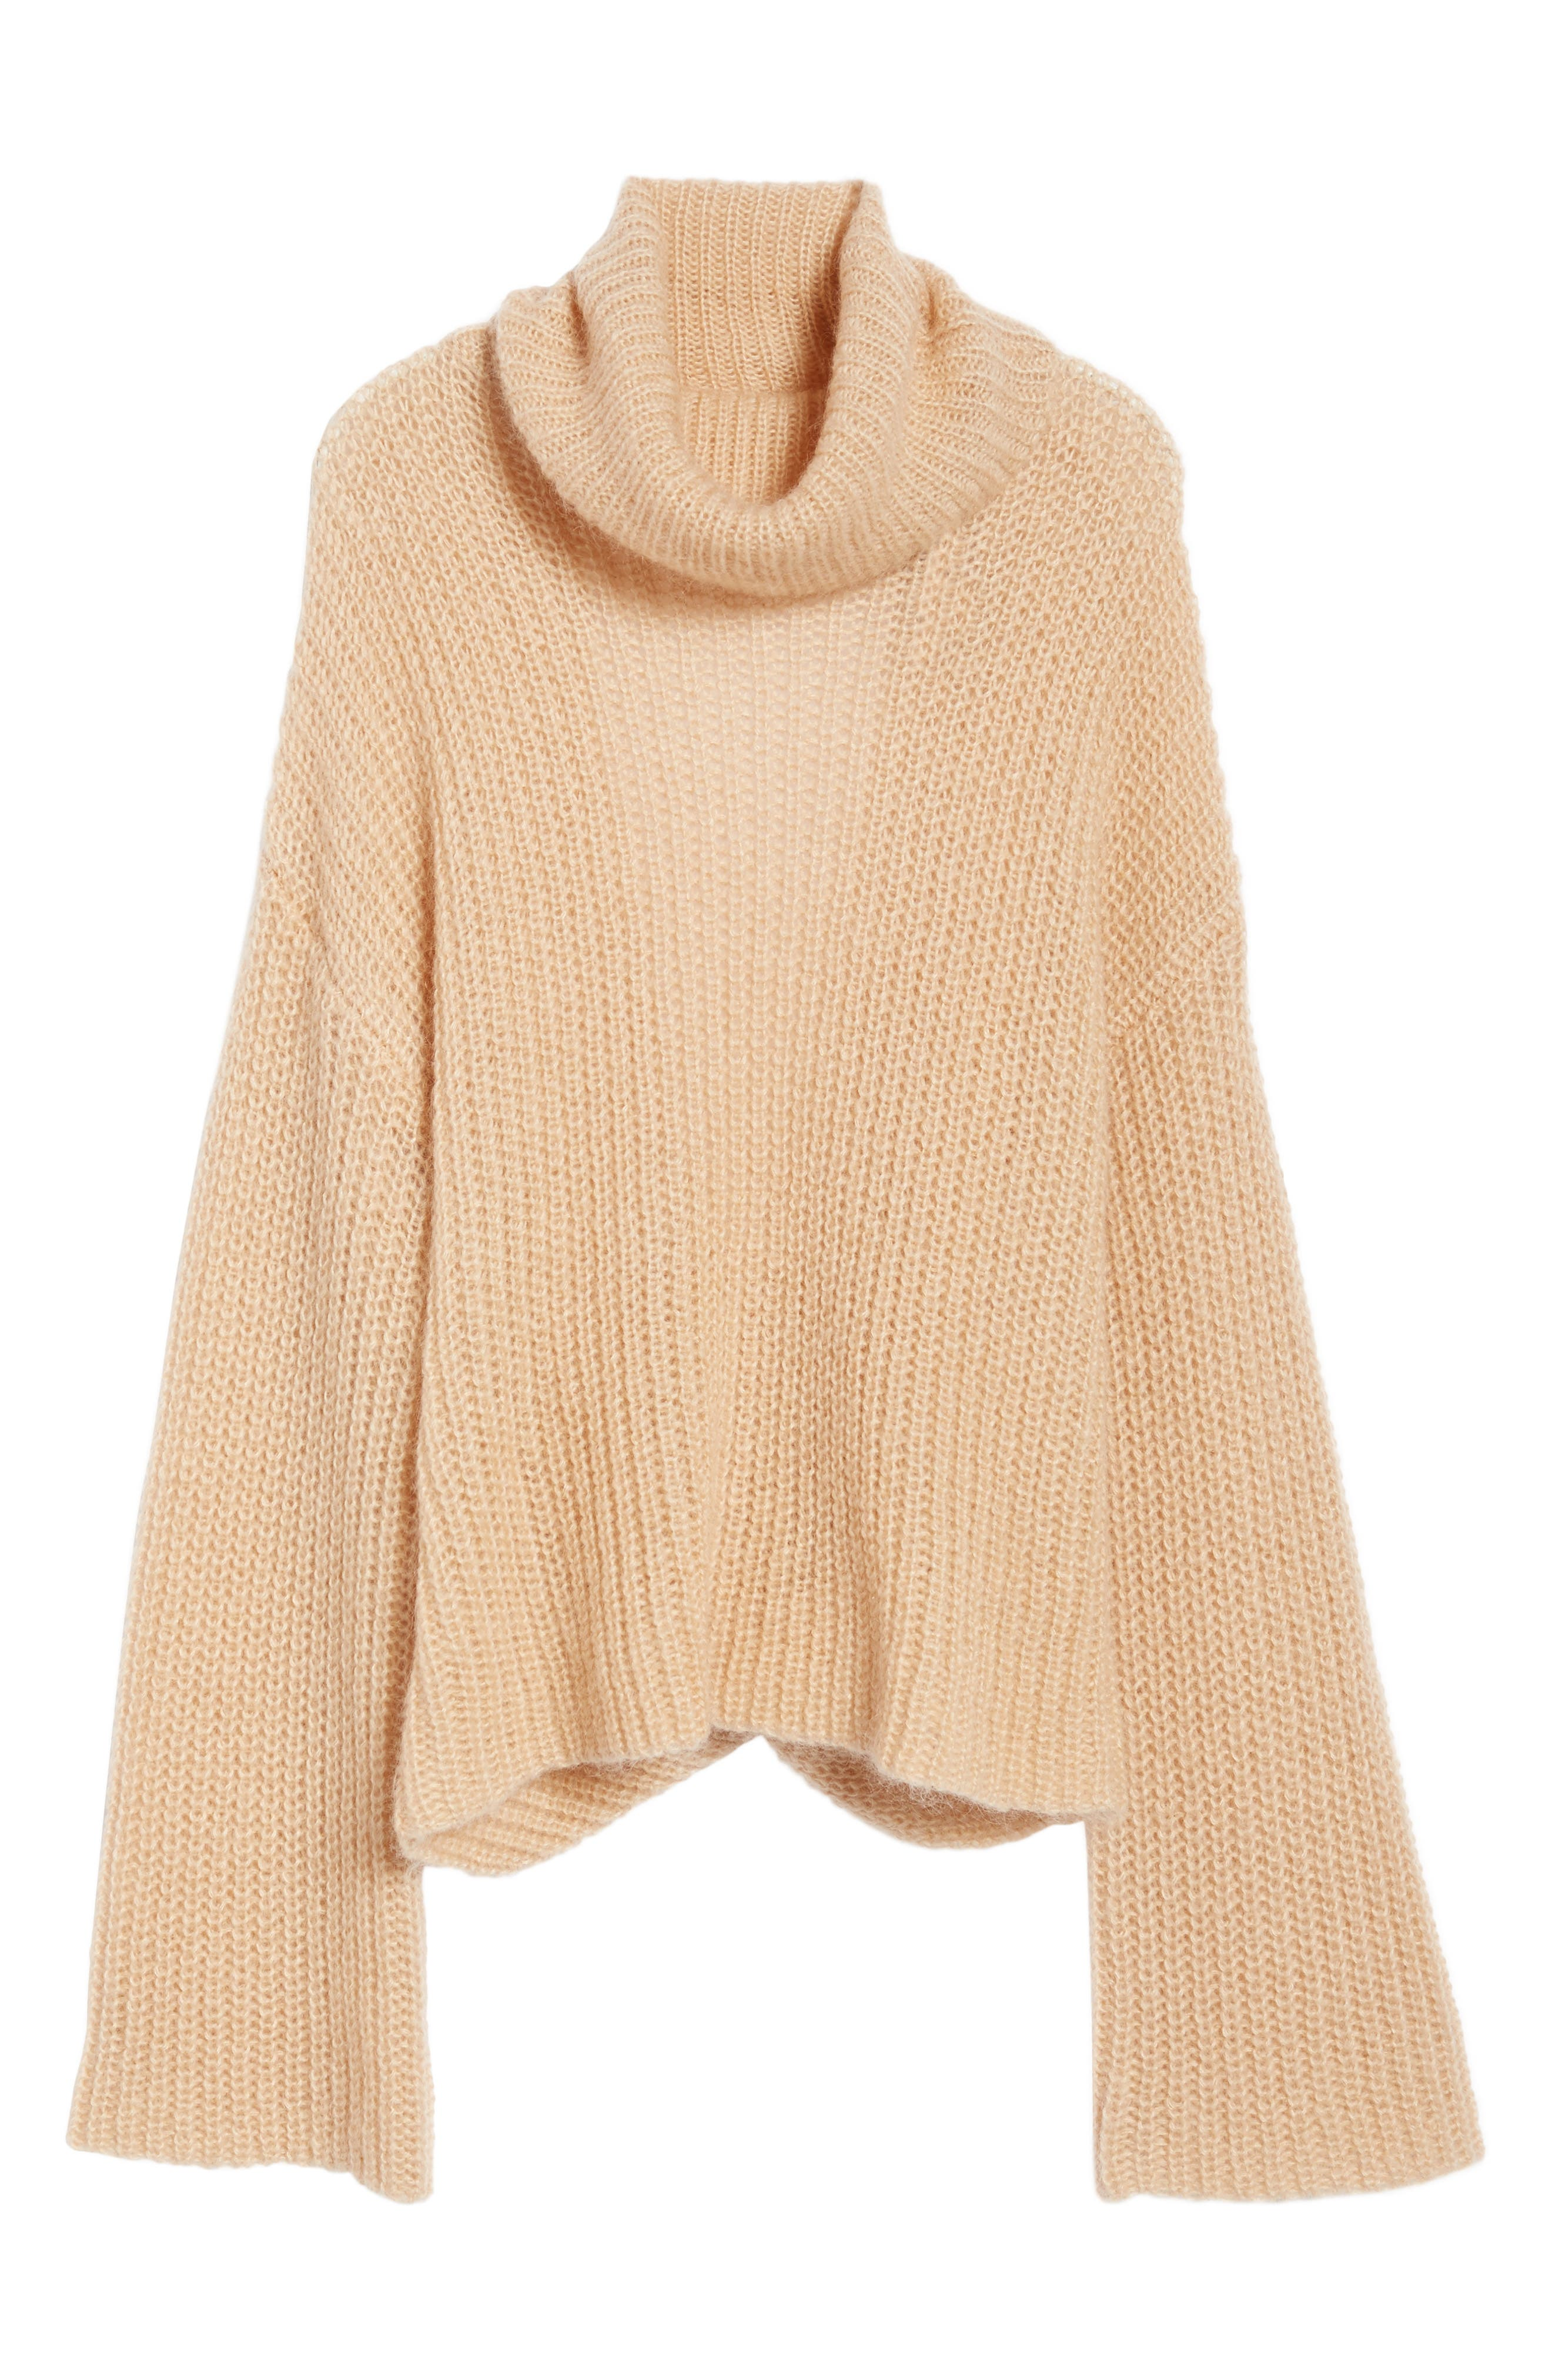 Cross Back Turtleneck Sweater,                             Alternate thumbnail 6, color,